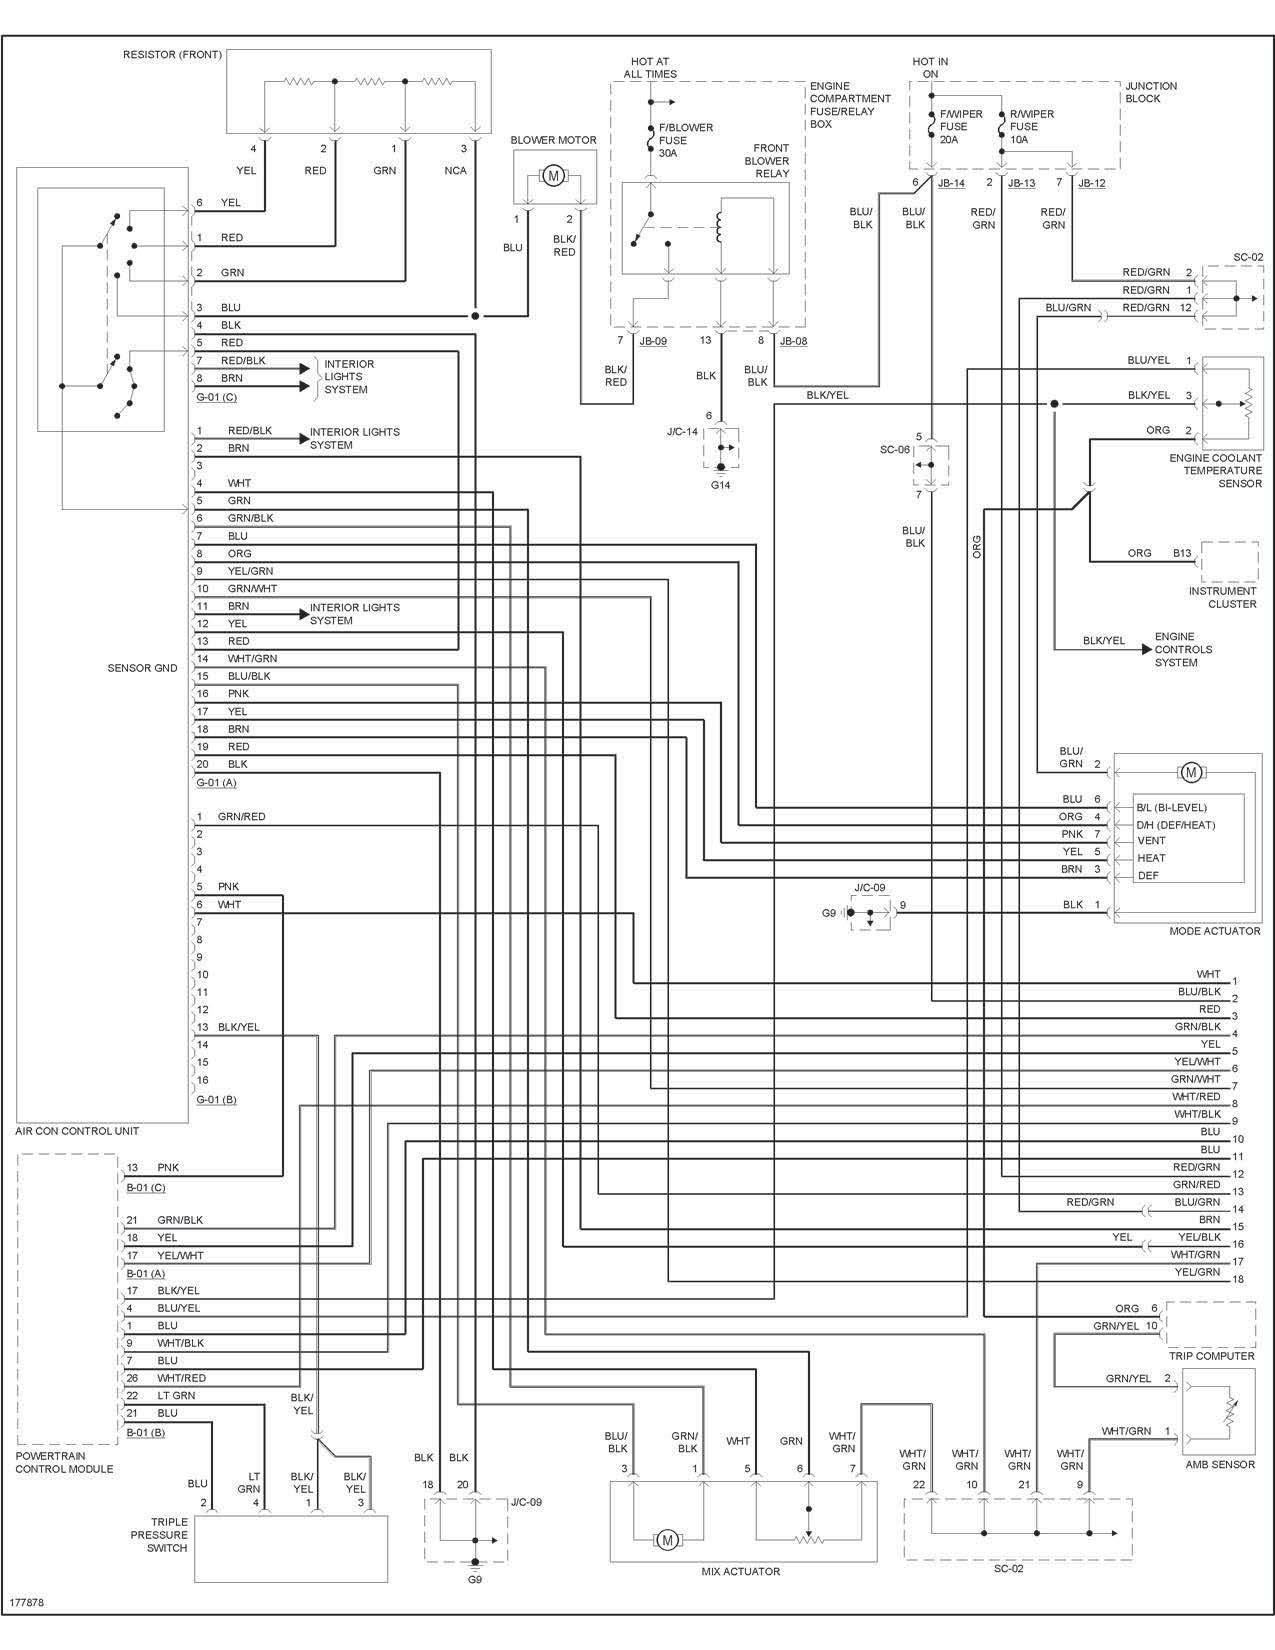 2002 kia engine fan wiring - wiring diagrams post camp-base -  camp-base.michelegori.it  michelegori.it